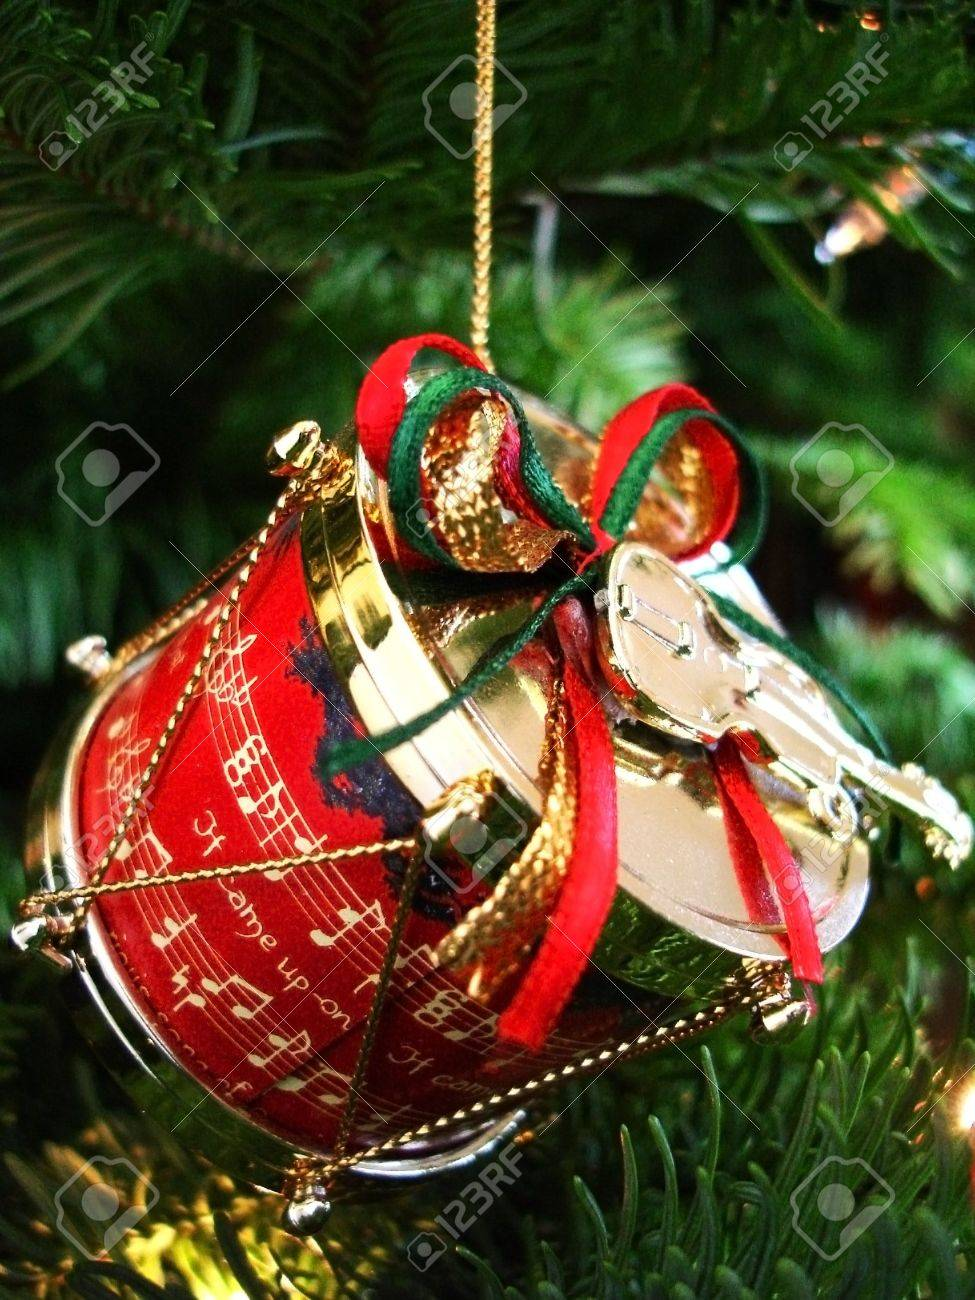 Christmas Drum.Christmas Drum And Violin Decoration